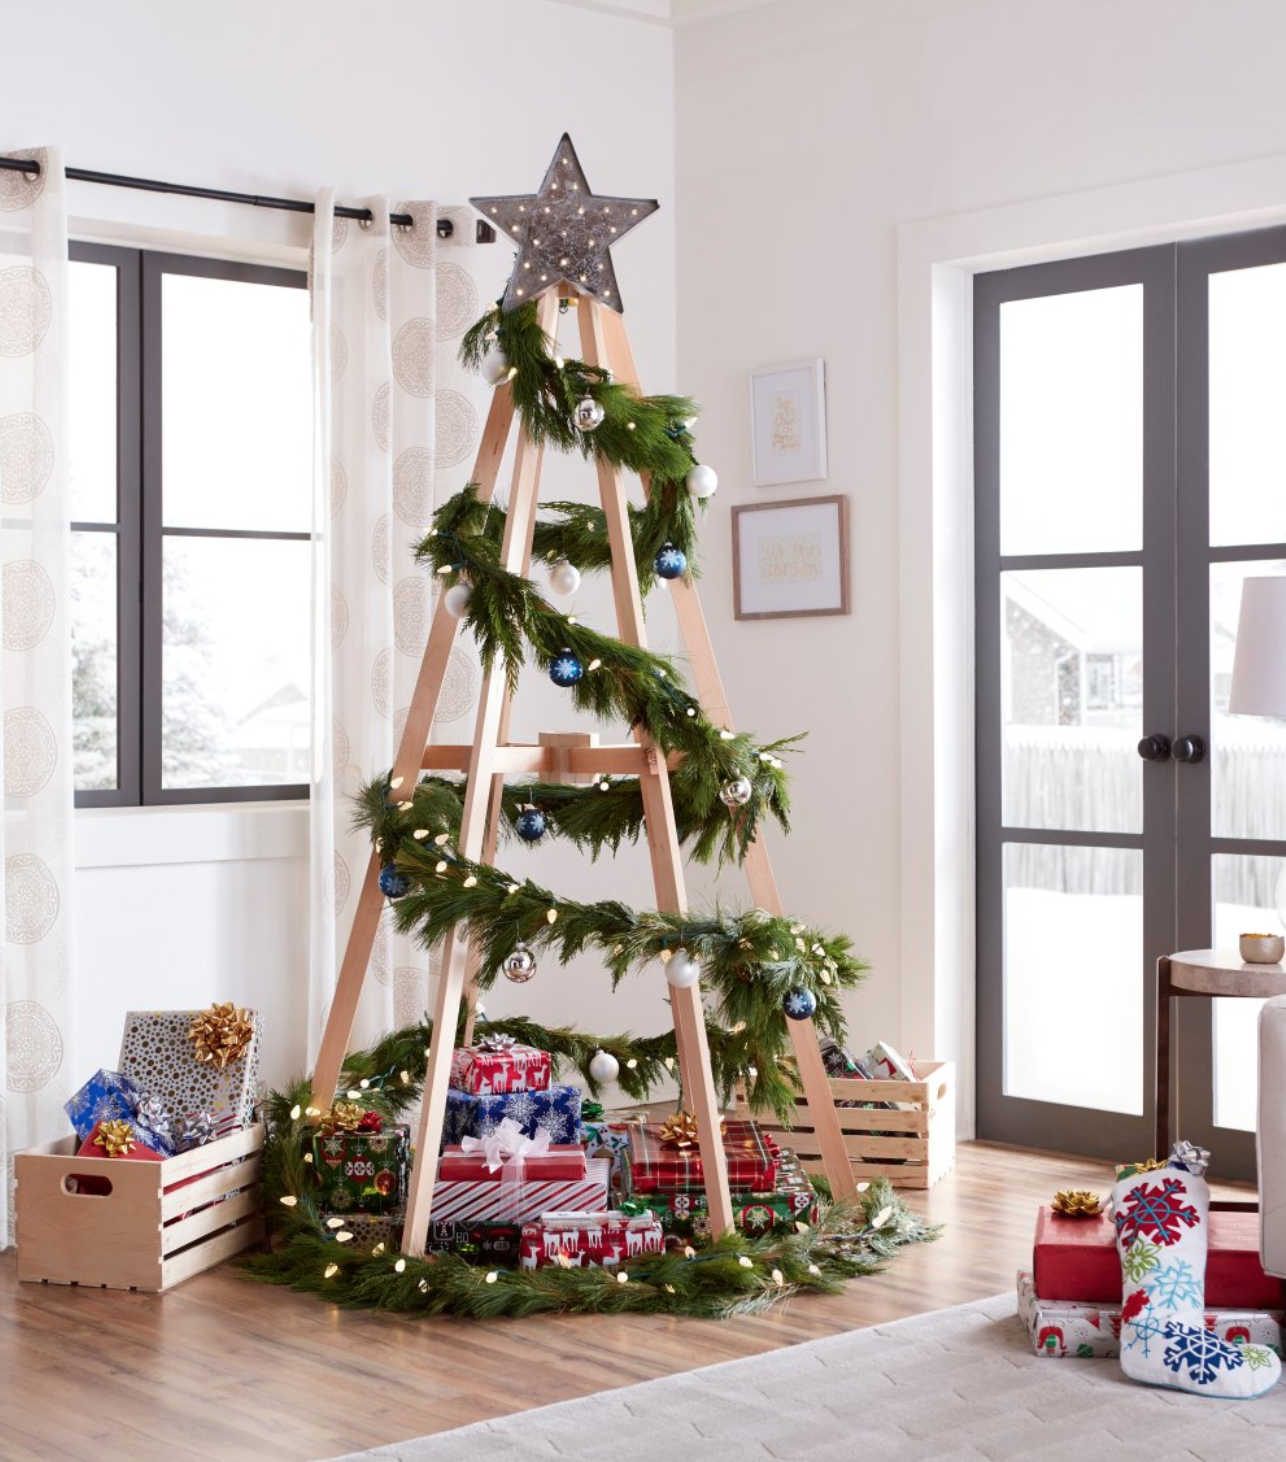 Christmas Decor Diy Cheap Quirky Christmas Decor Diy Christmas Decor Diy Cheap Wooden Christmas Decorations